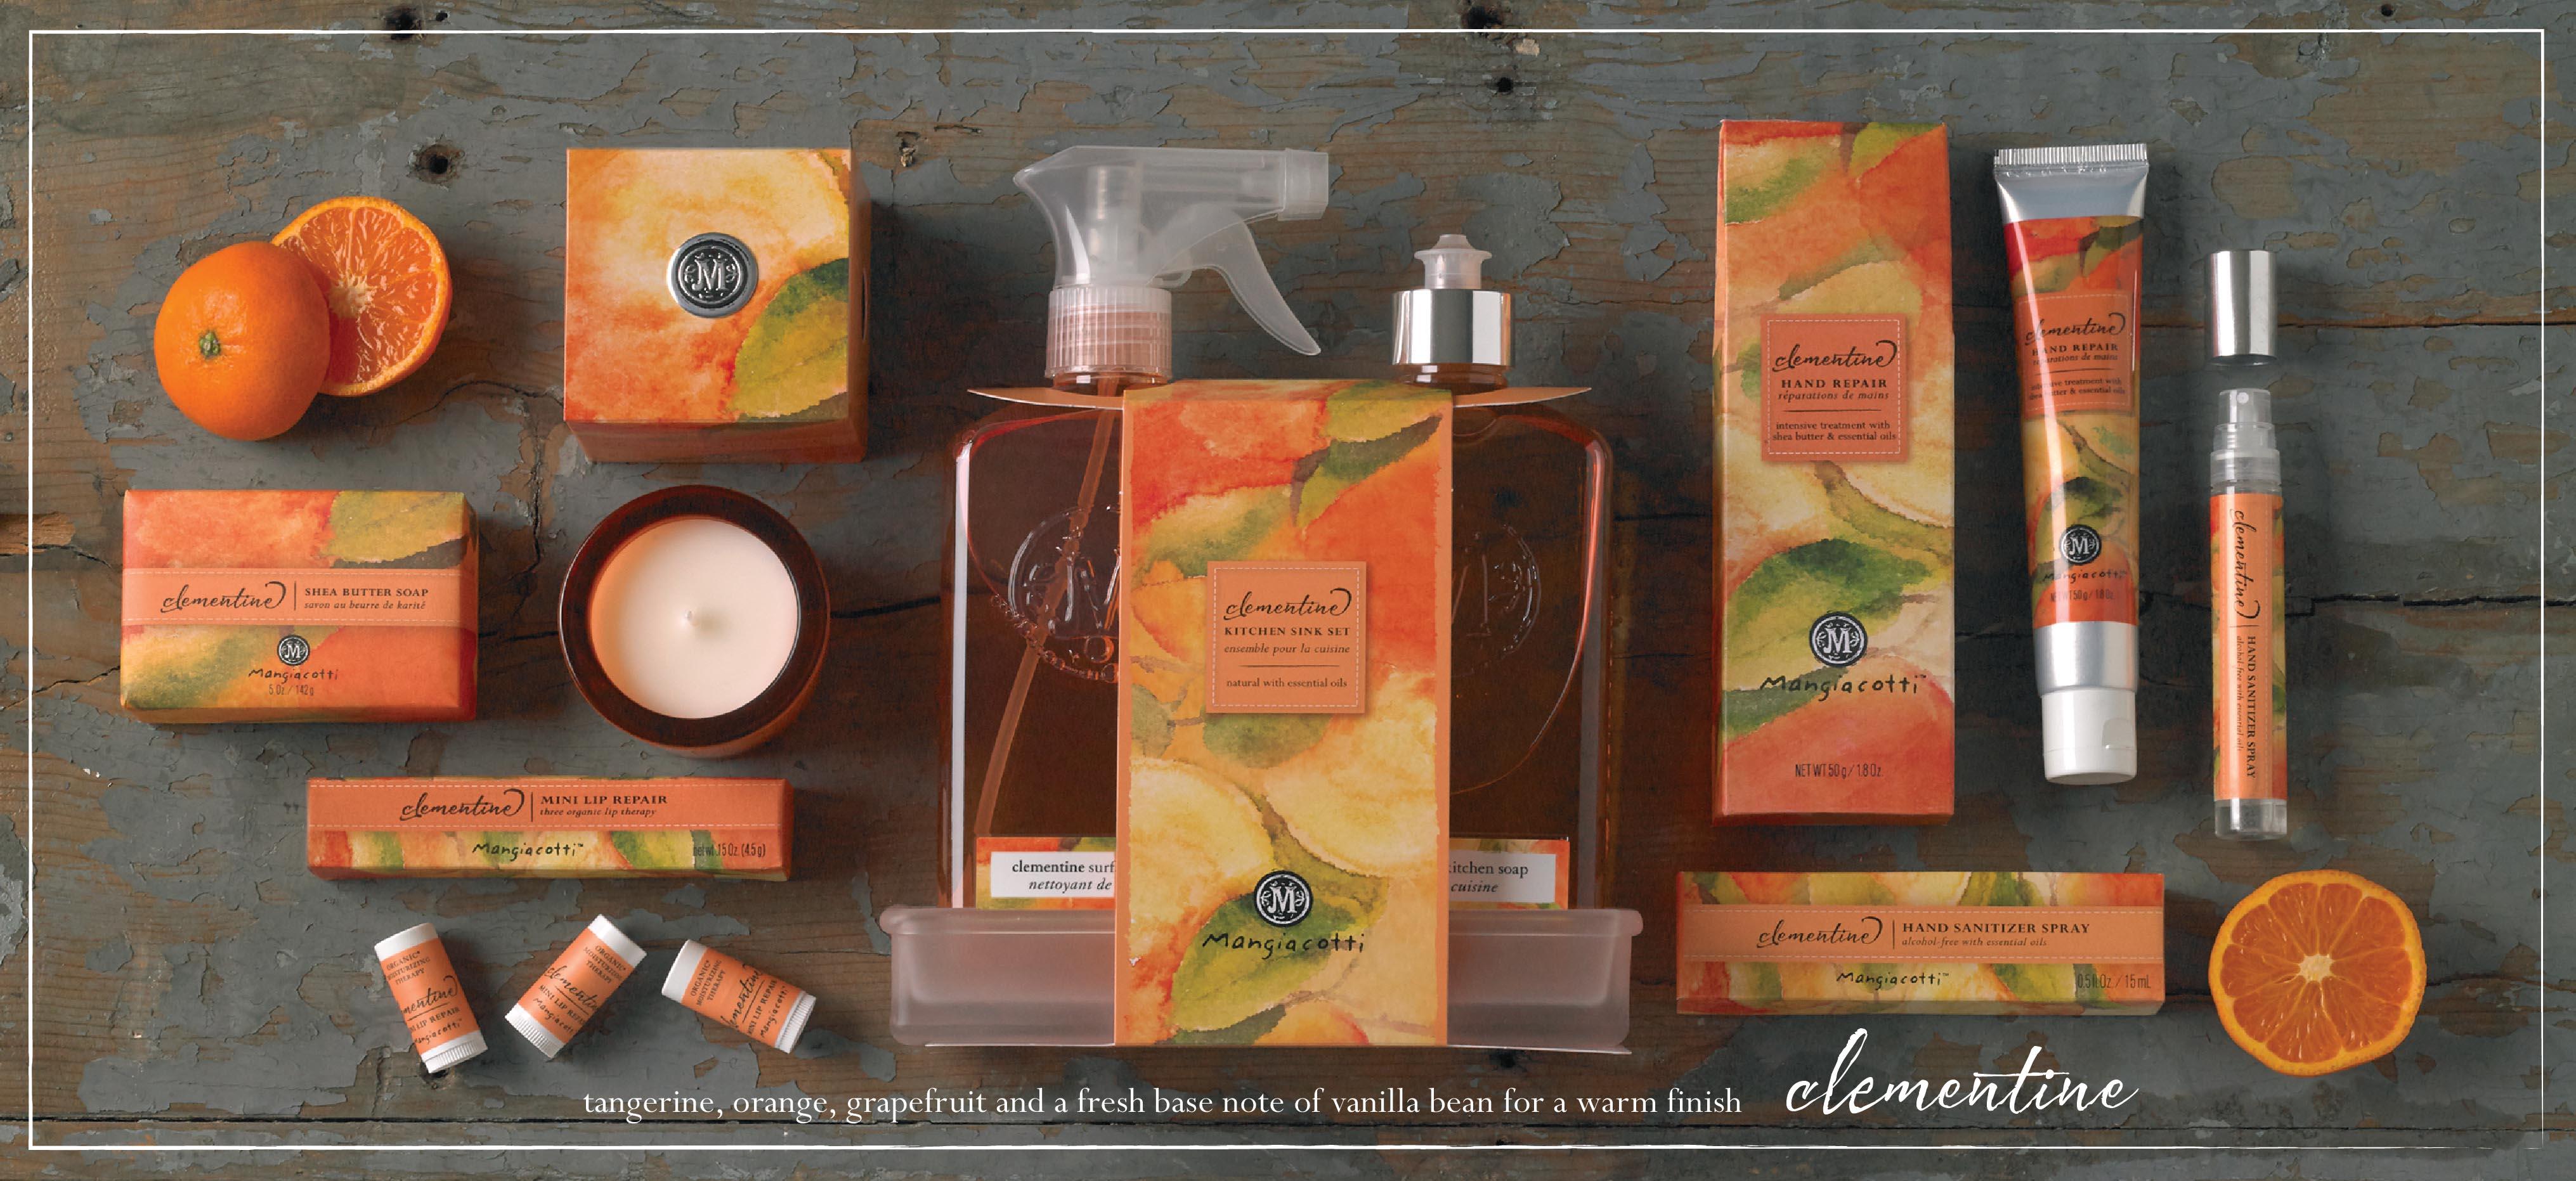 clementine-web-fragrance-2020.jpg